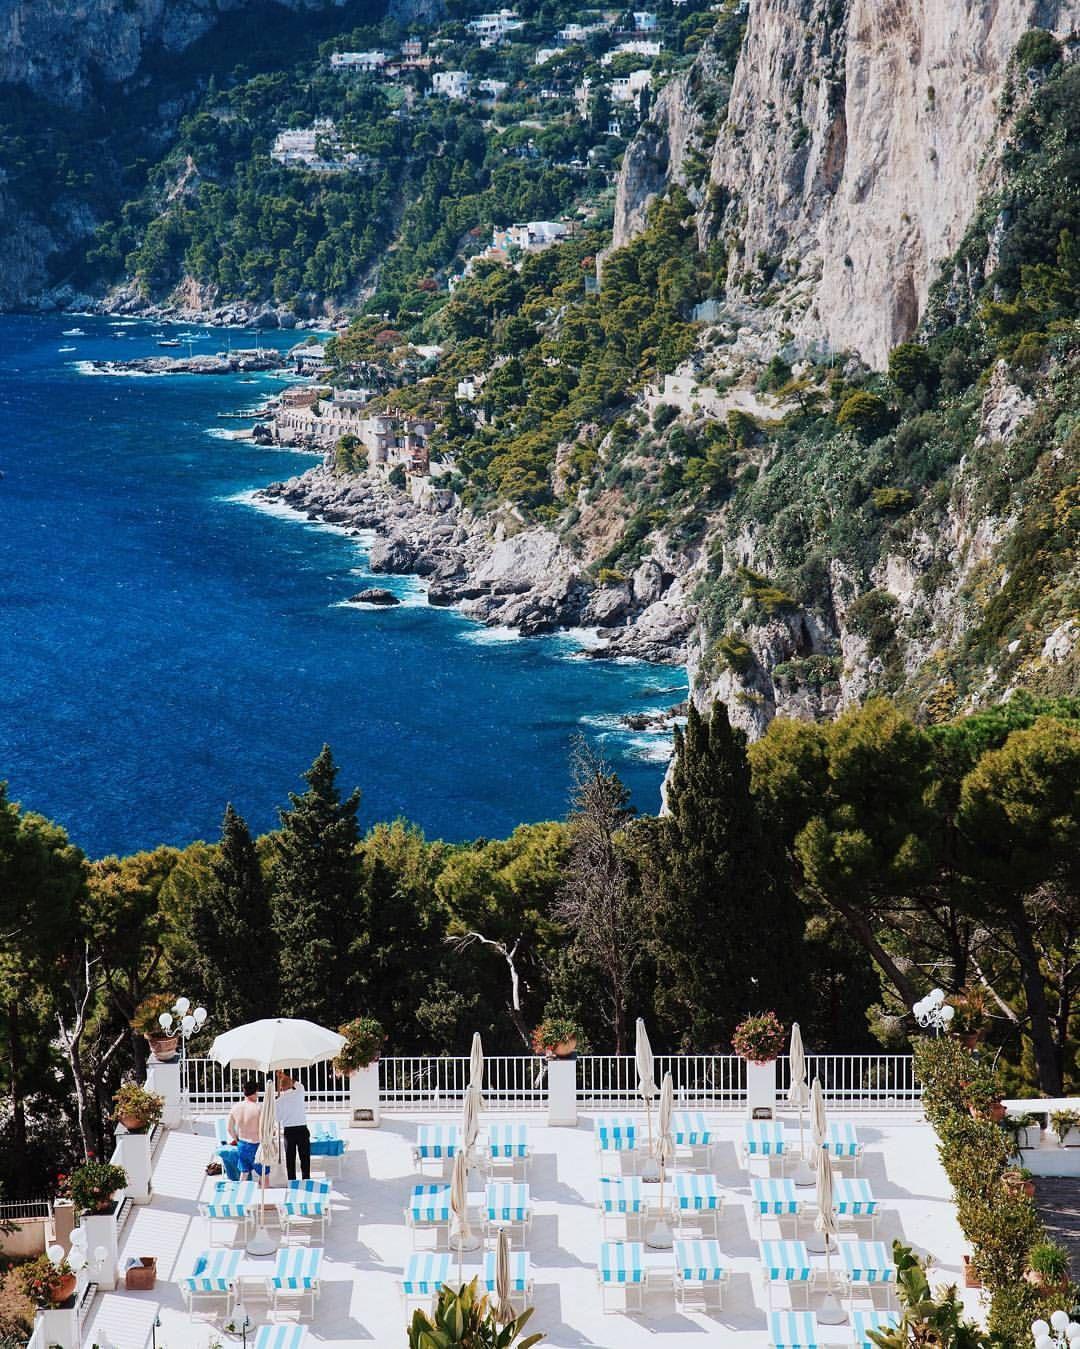 Hotel Villa Brunella Capri Italy Louiseroe Italy